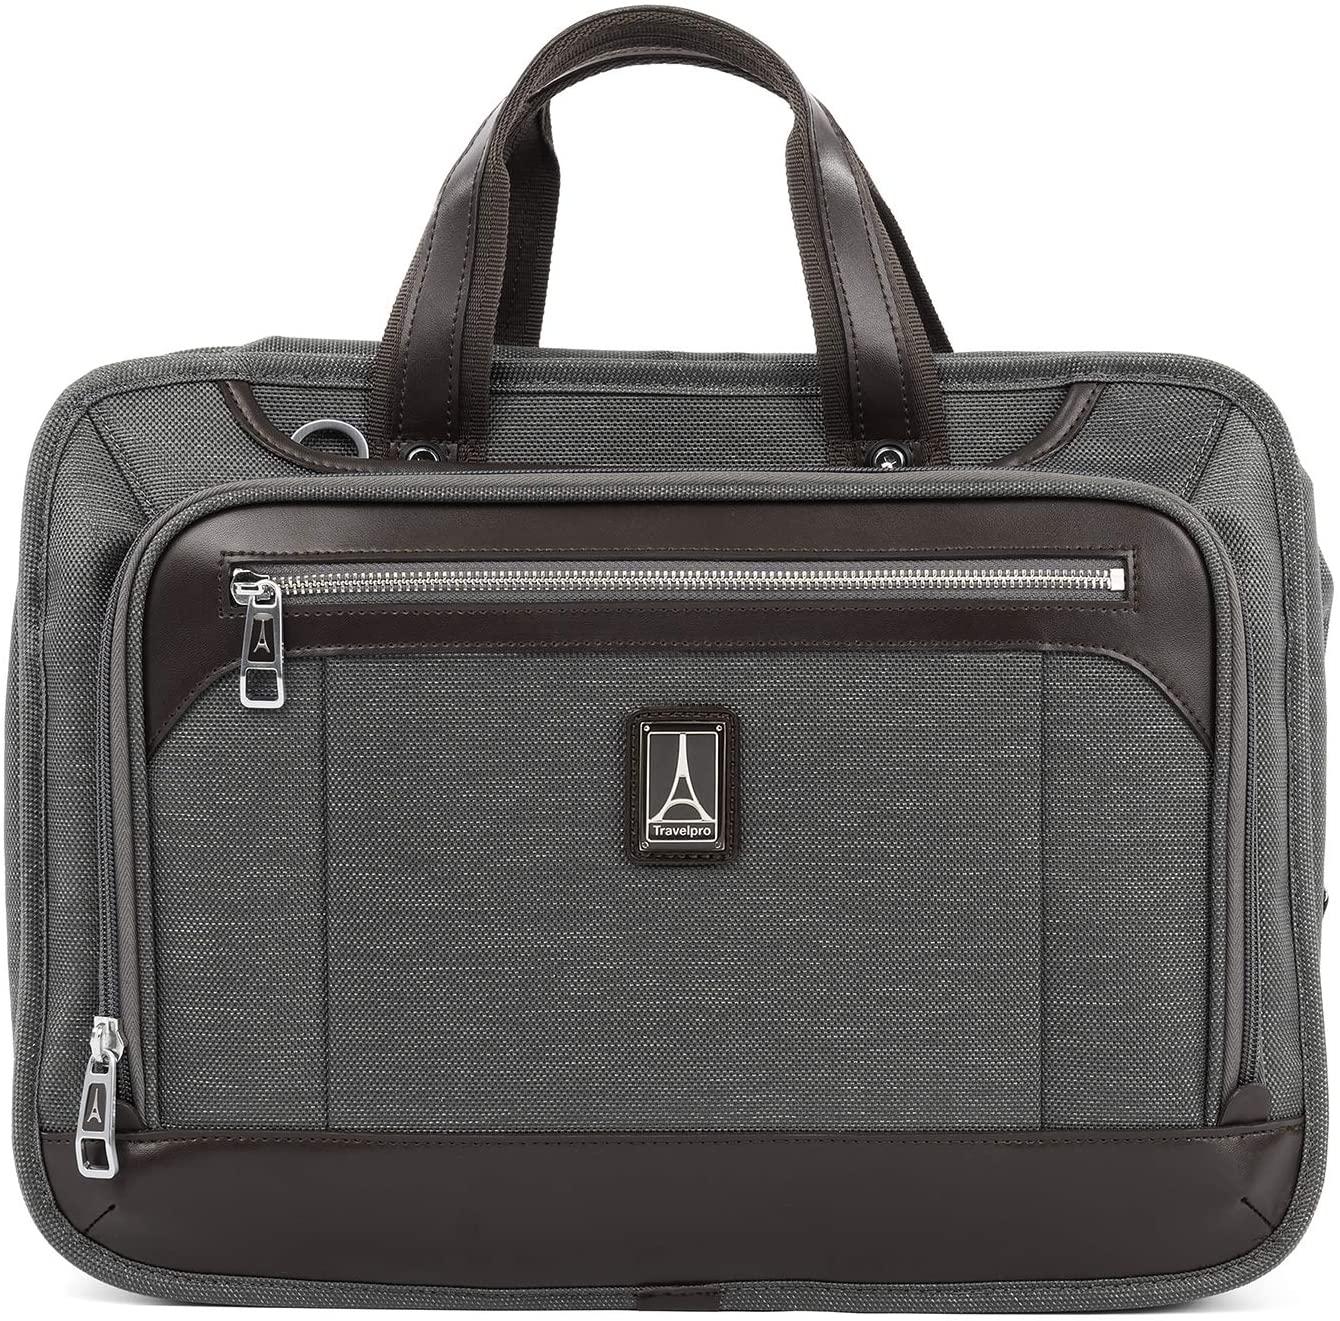 B07DLB6JWT Travelpro Platinum Elite-Slim Business Laptop Briefcase, Vintage Grey, 16-Inch